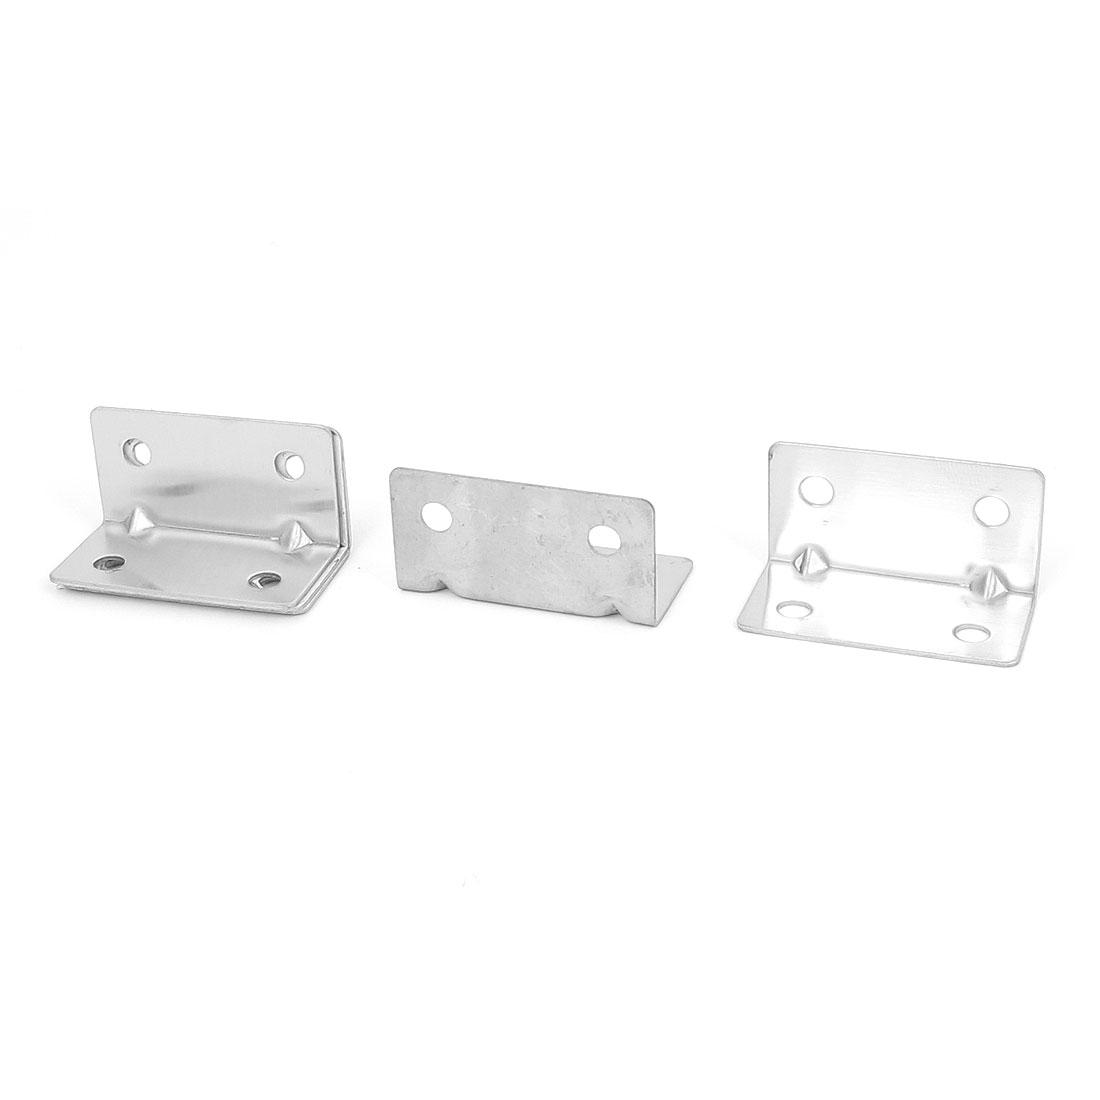 21mmx21mmx40mm L Shape Corner Brace Repair Right Angle Bracket Shelf Support 5pcs